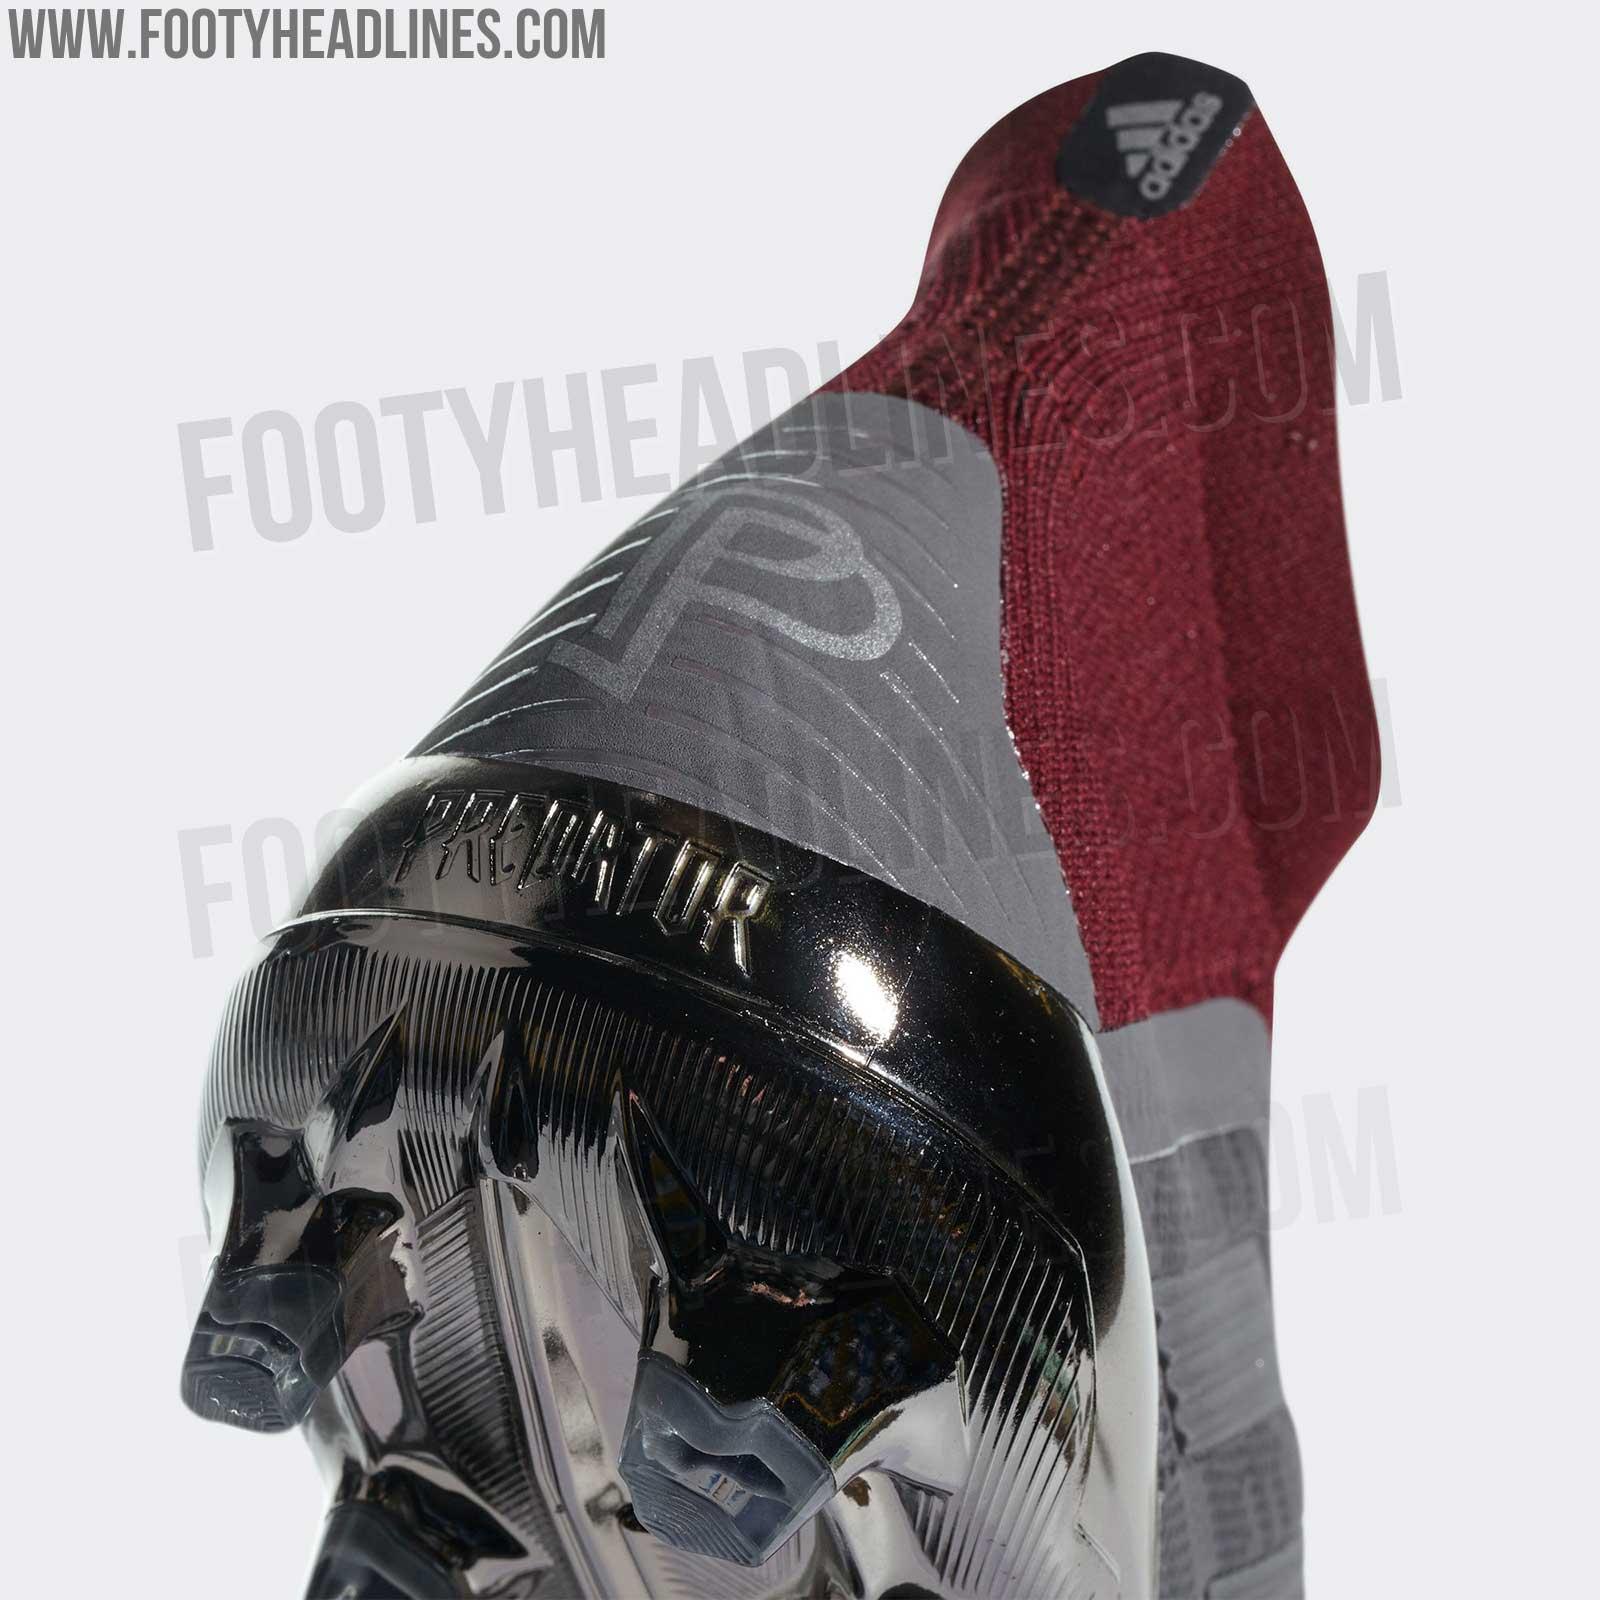 ea81b4ead50 Full Adidas Paul Pogba Season 3  Predator  Collection Leaked ...